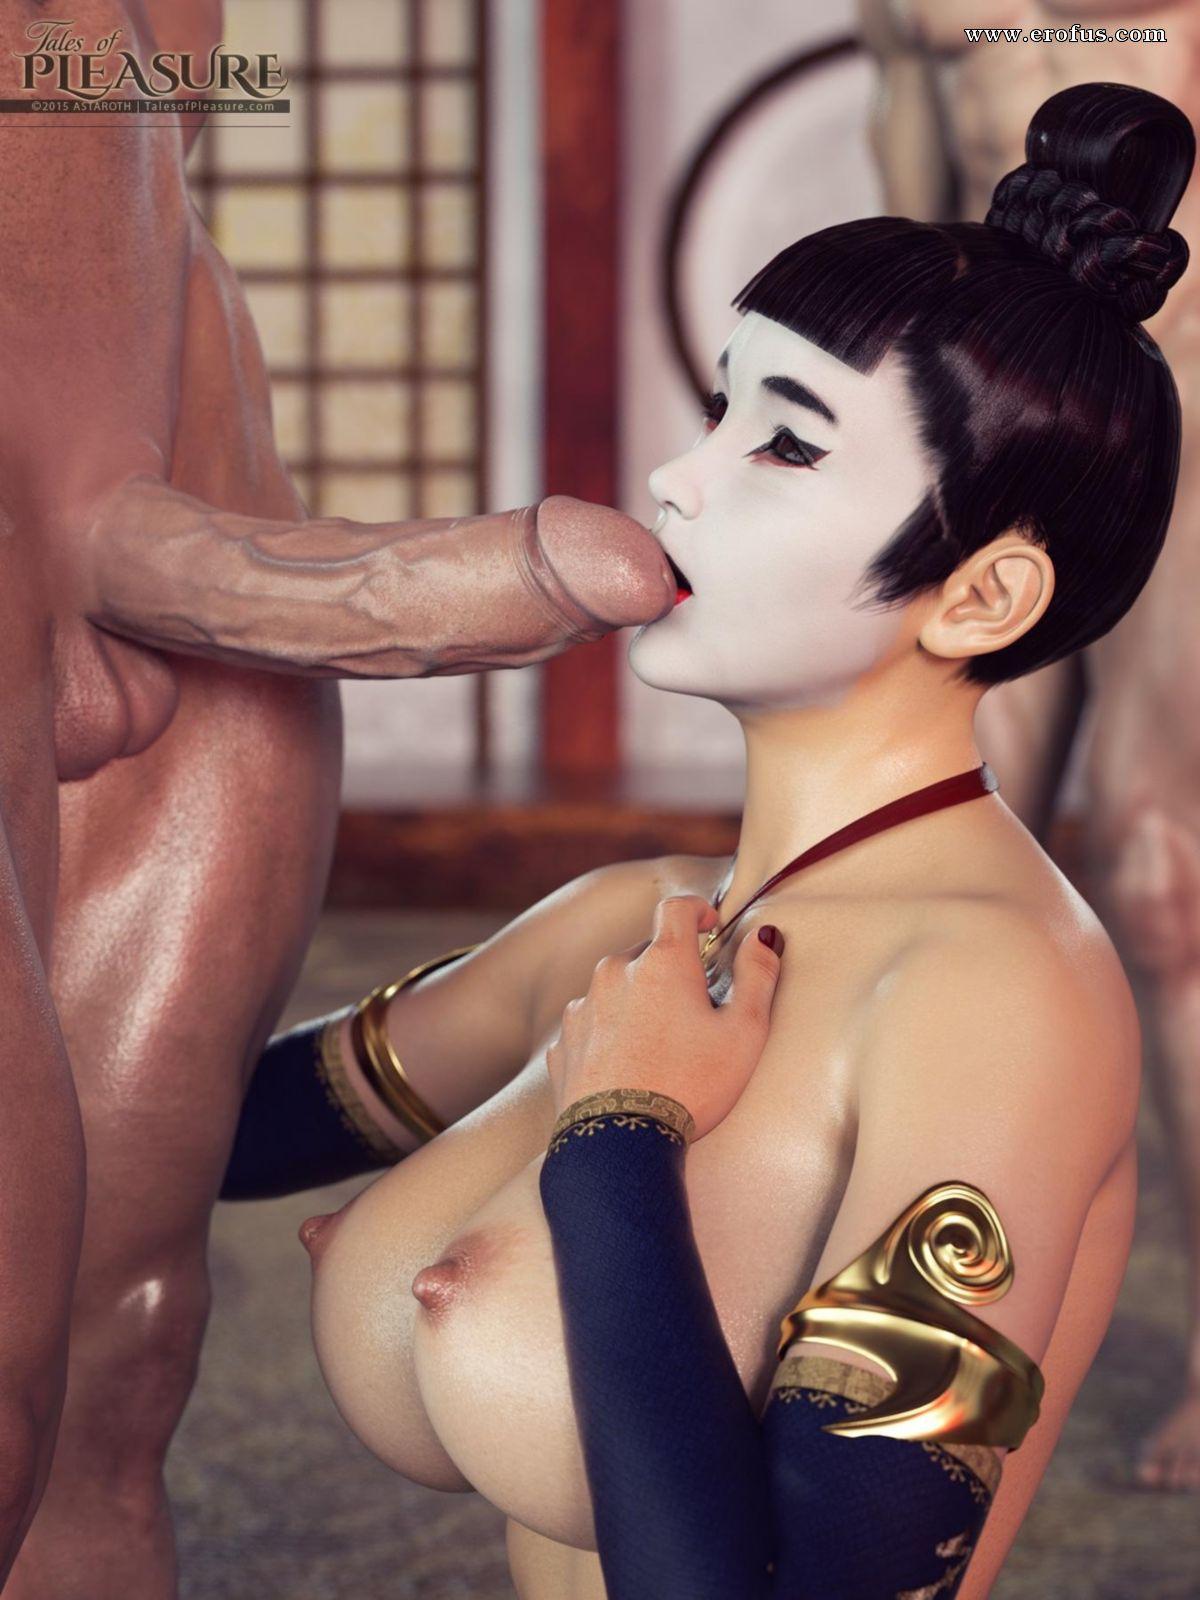 Dojo hentai free porn galery, hot sex pics